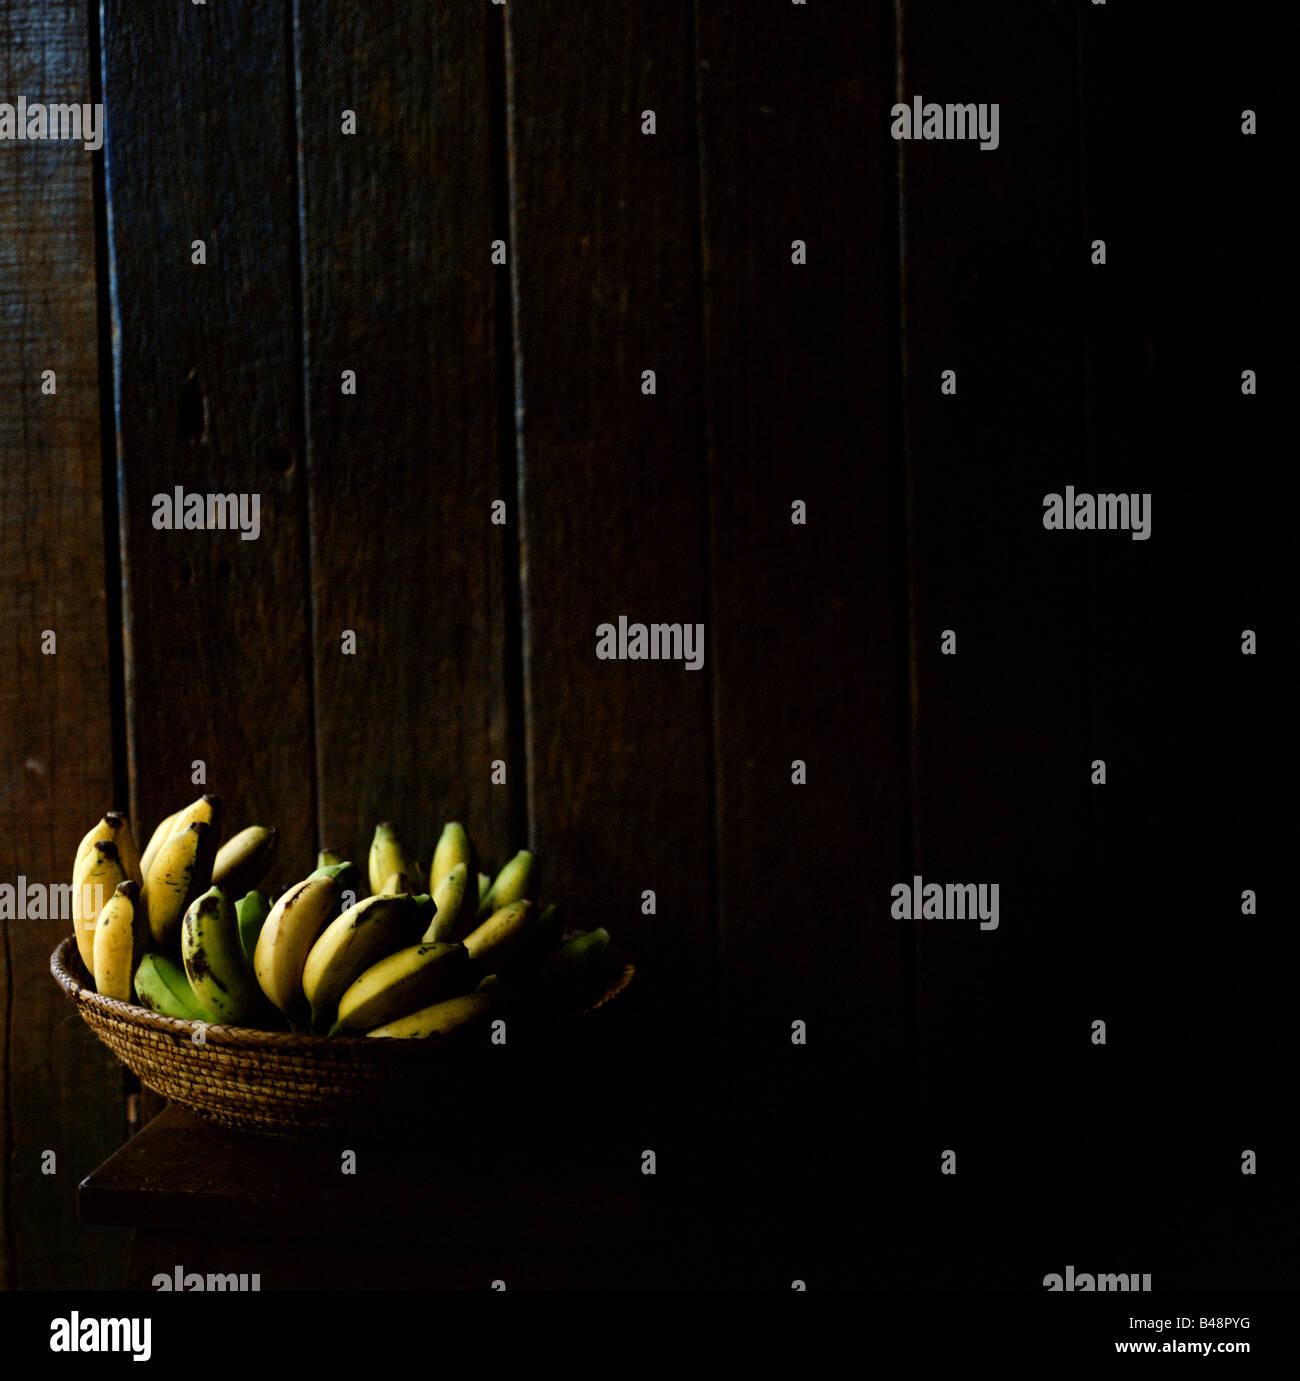 Bananas are a staple in Uganda. - Stock Image